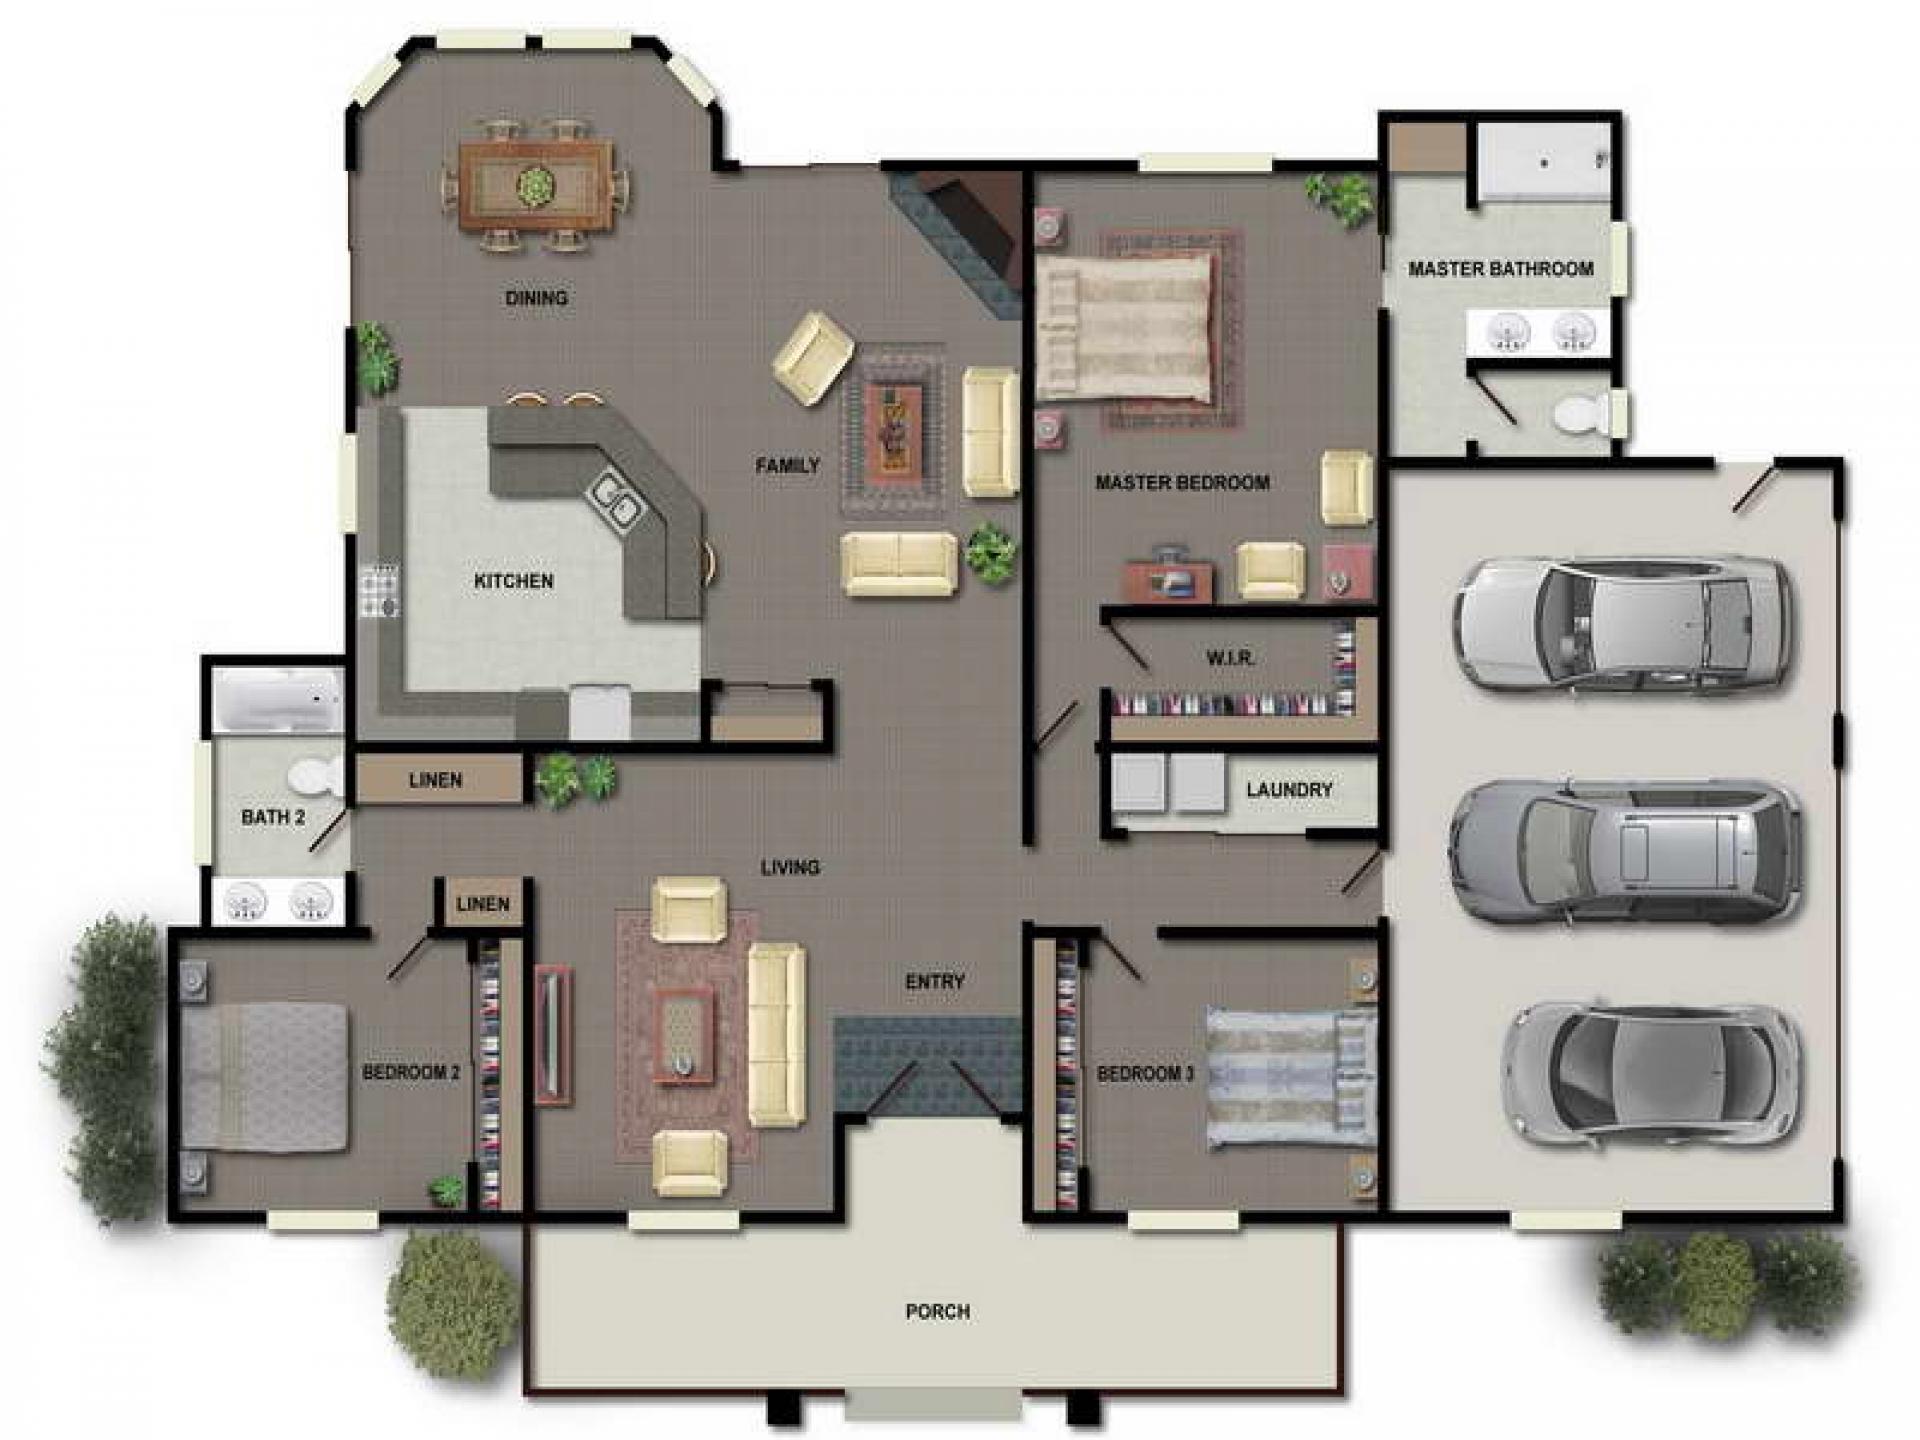 1920x1440 Architectural Designs Contemporary Plans Clipgoo House Interior